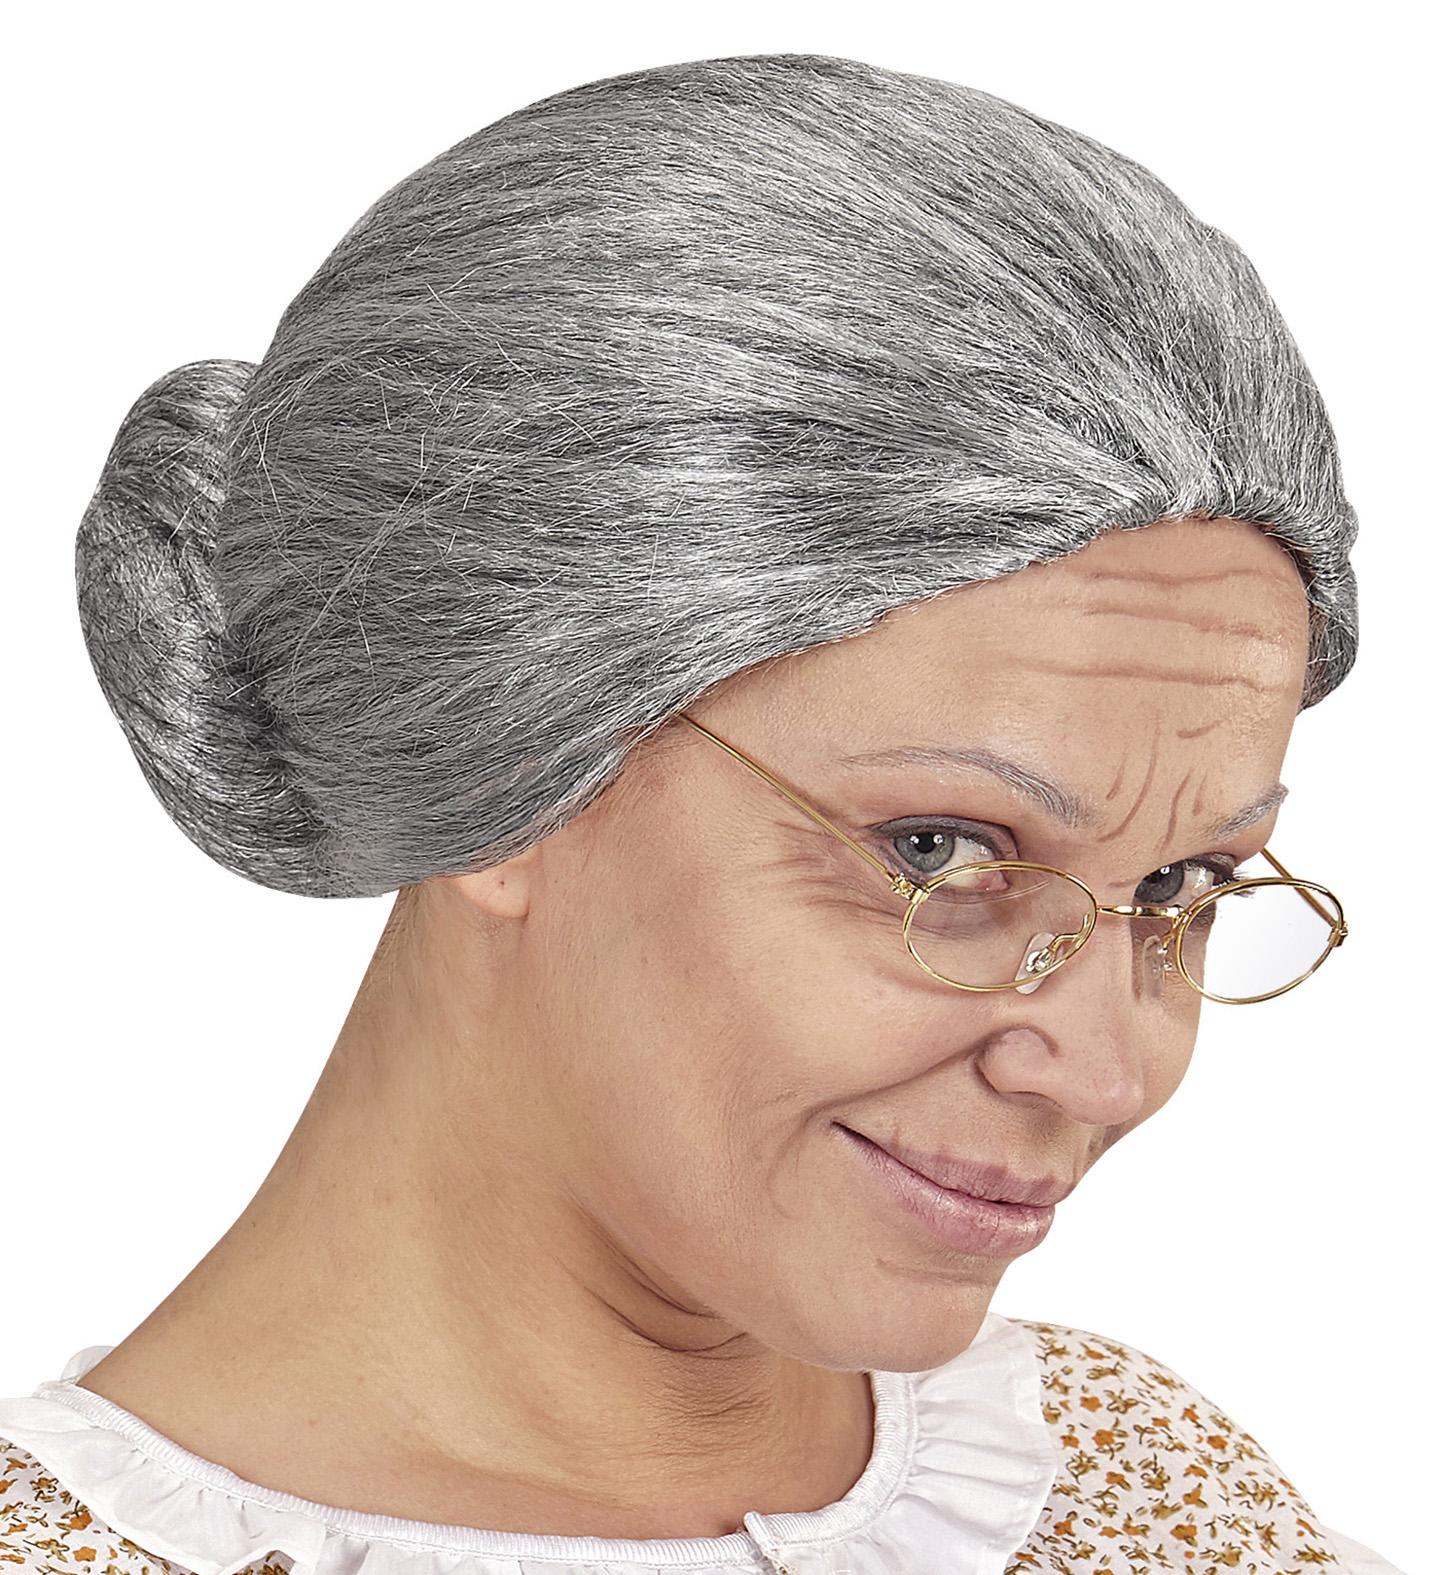 oma damen per cke grau meliert dutt greisin alte gro mutter omi m rchen haare knoten haarnetz. Black Bedroom Furniture Sets. Home Design Ideas